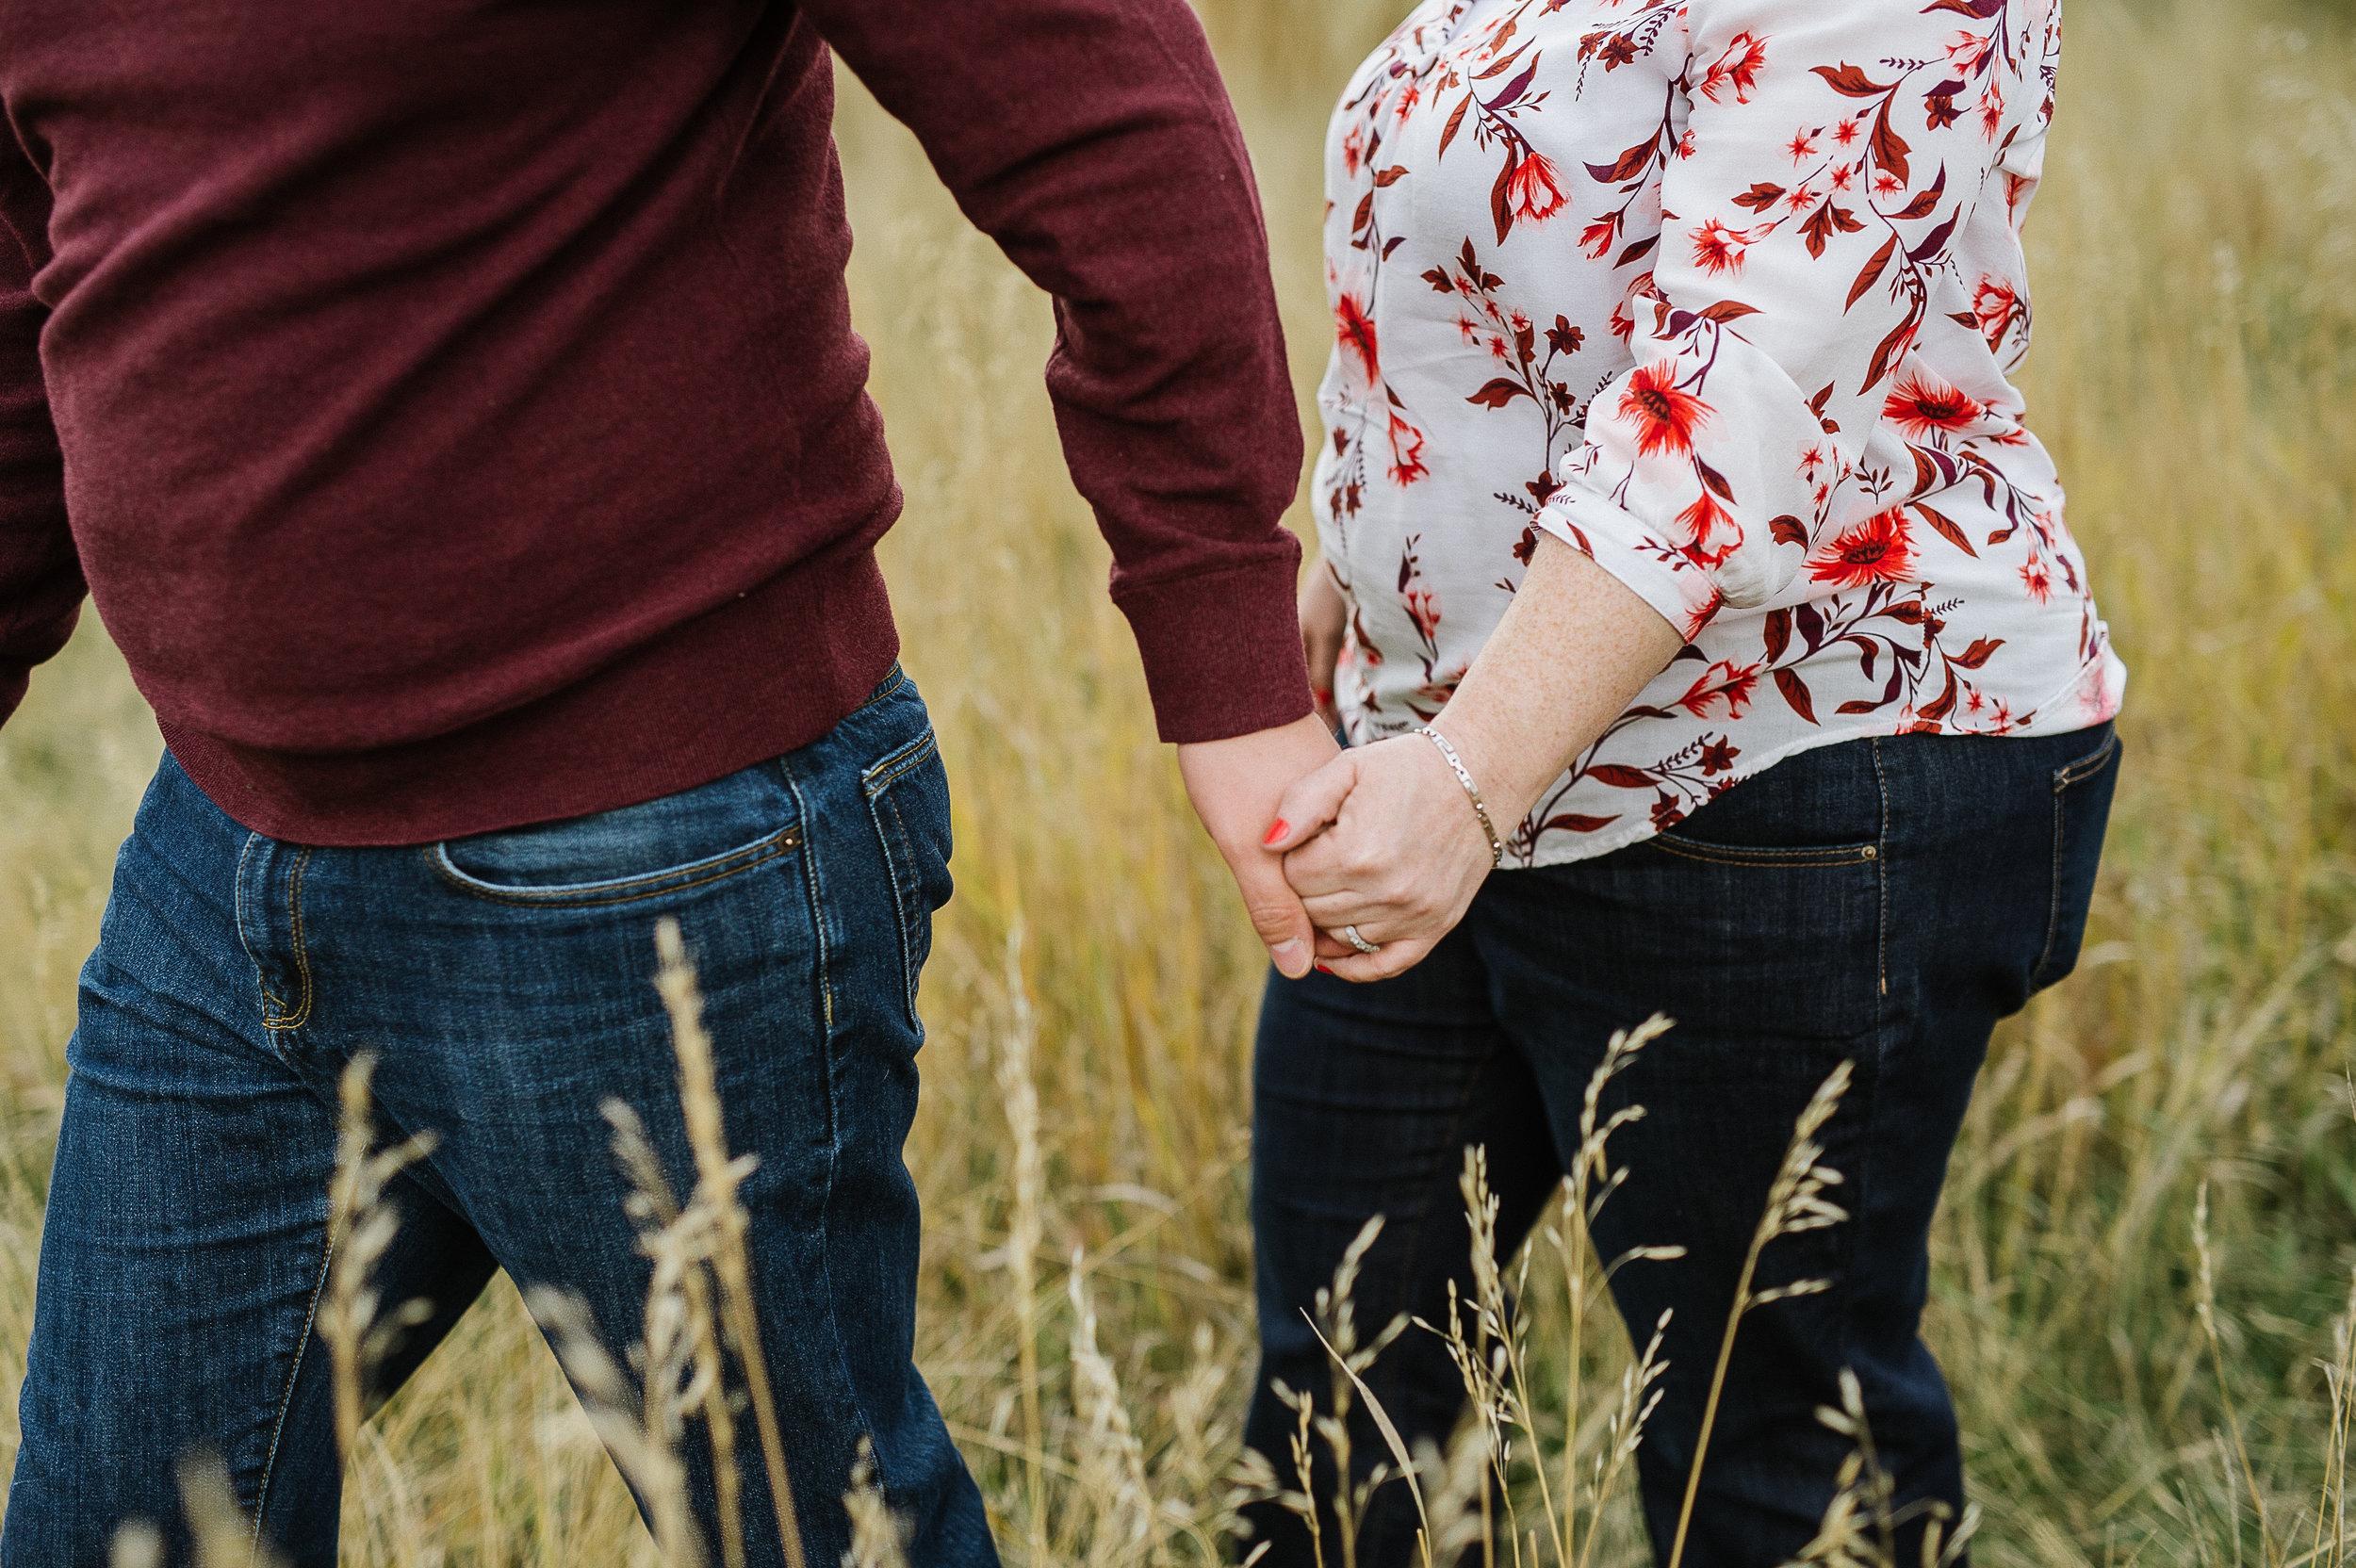 Calgary_Wedding_Photography_Amanda_Marc_Engagements_2017_HR 0034.jpg